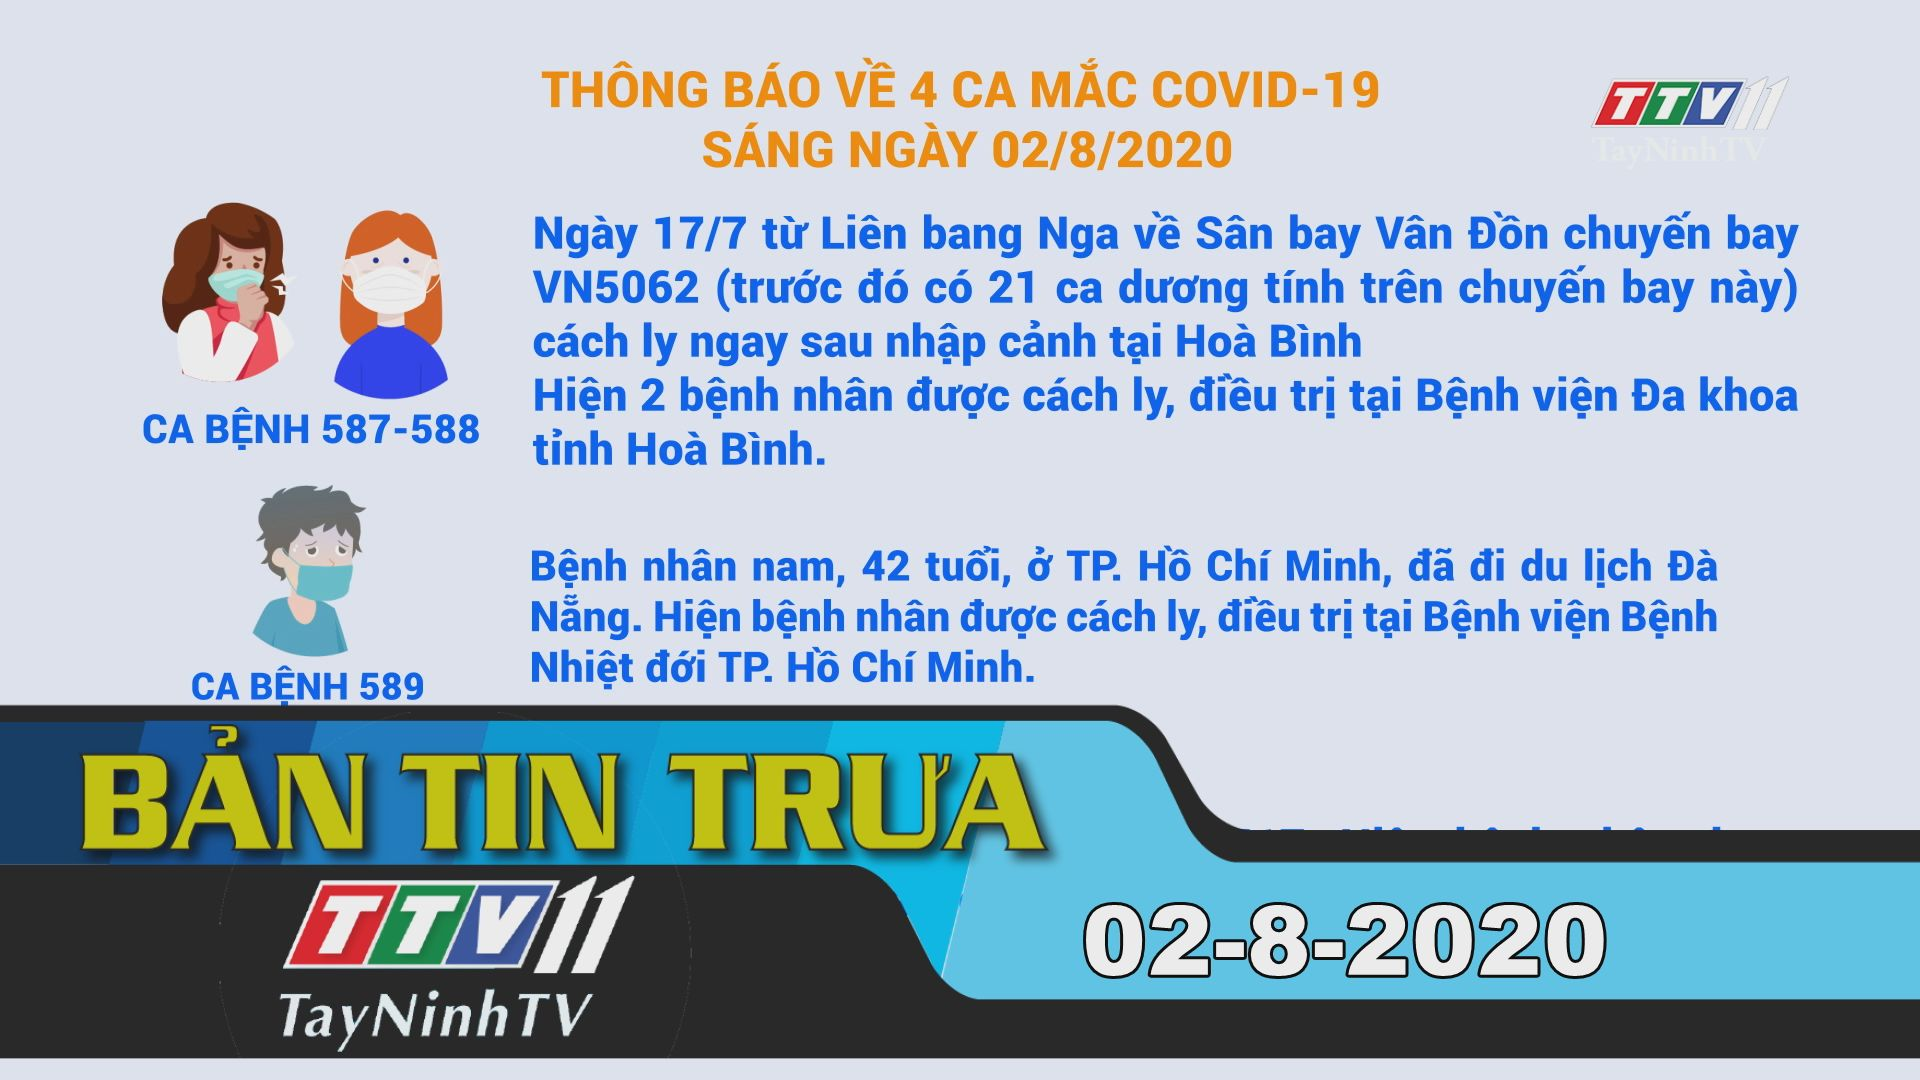 Bản tin trưa 02-8-2020 | Tin tức hôm nay | TayNinhTV